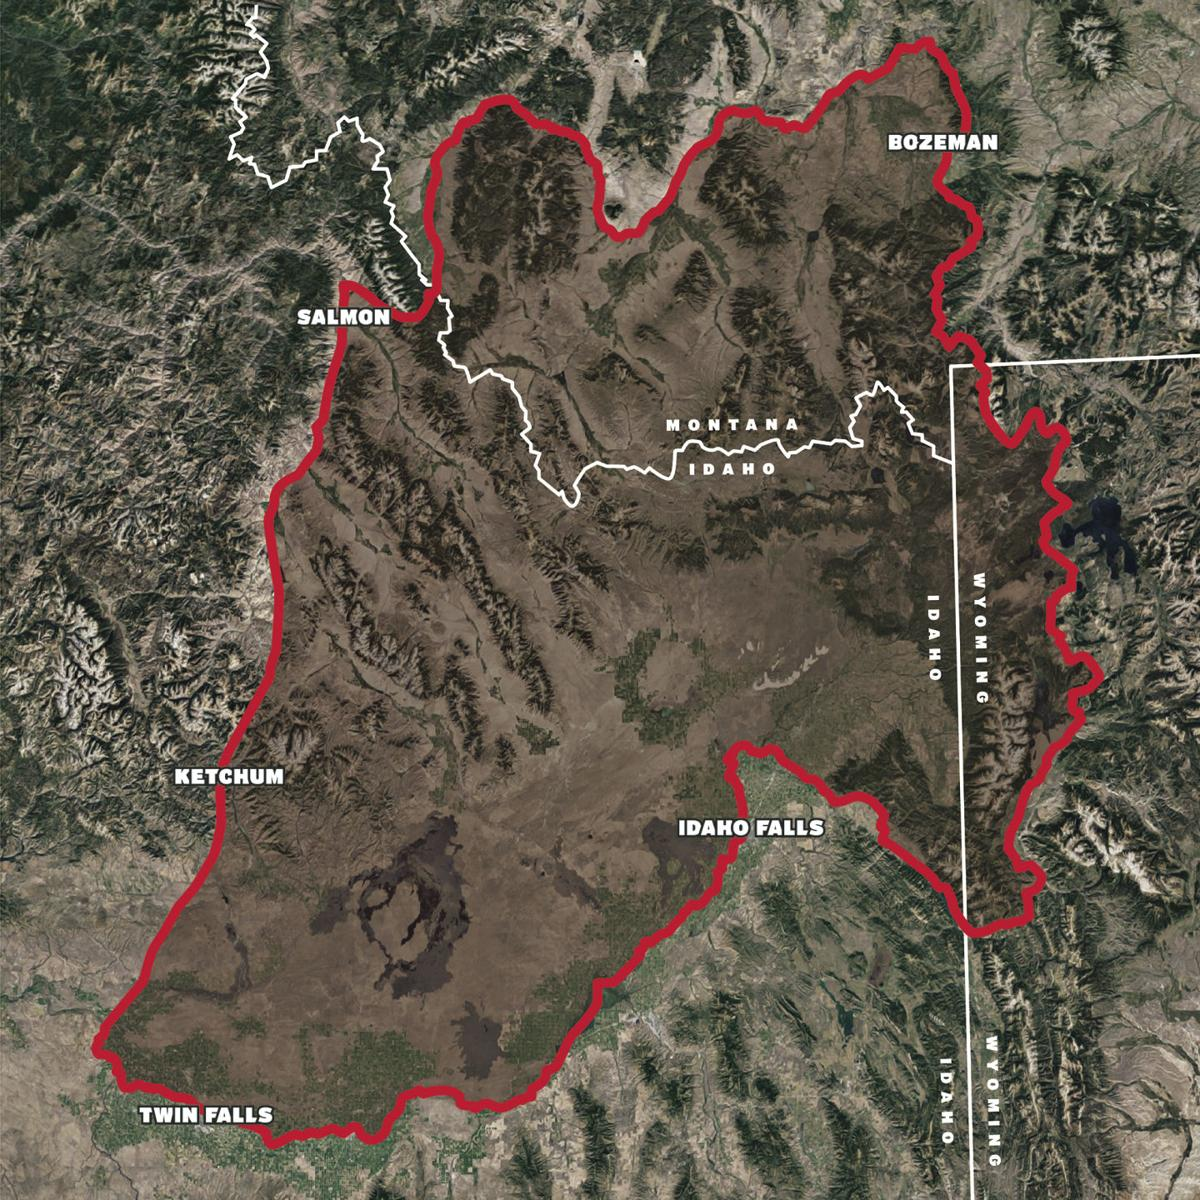 19-09-11 Cession map-01.jpg